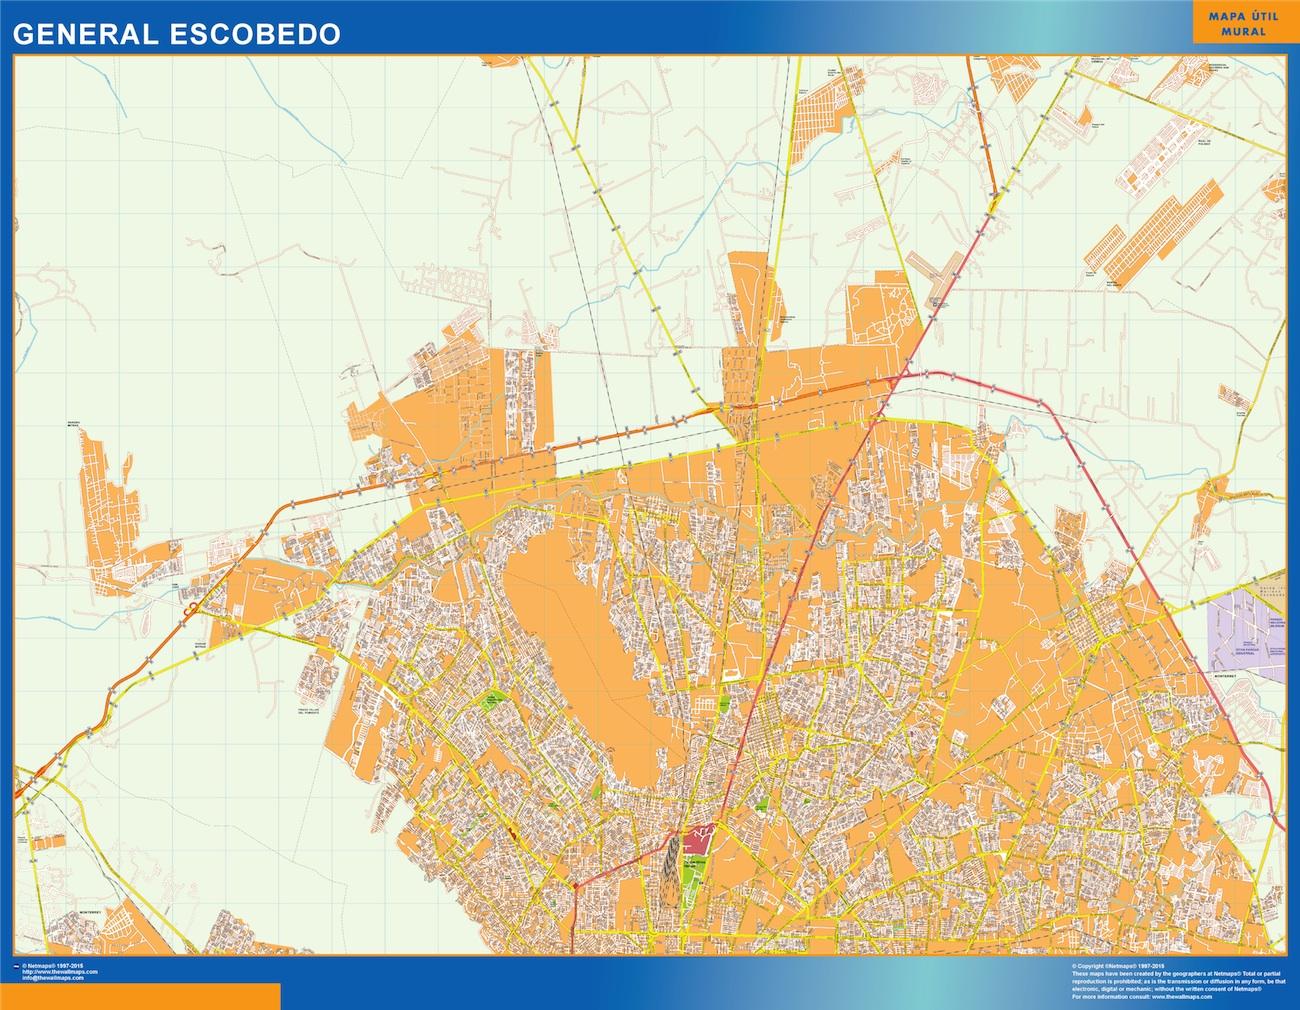 mapa General Escobedo